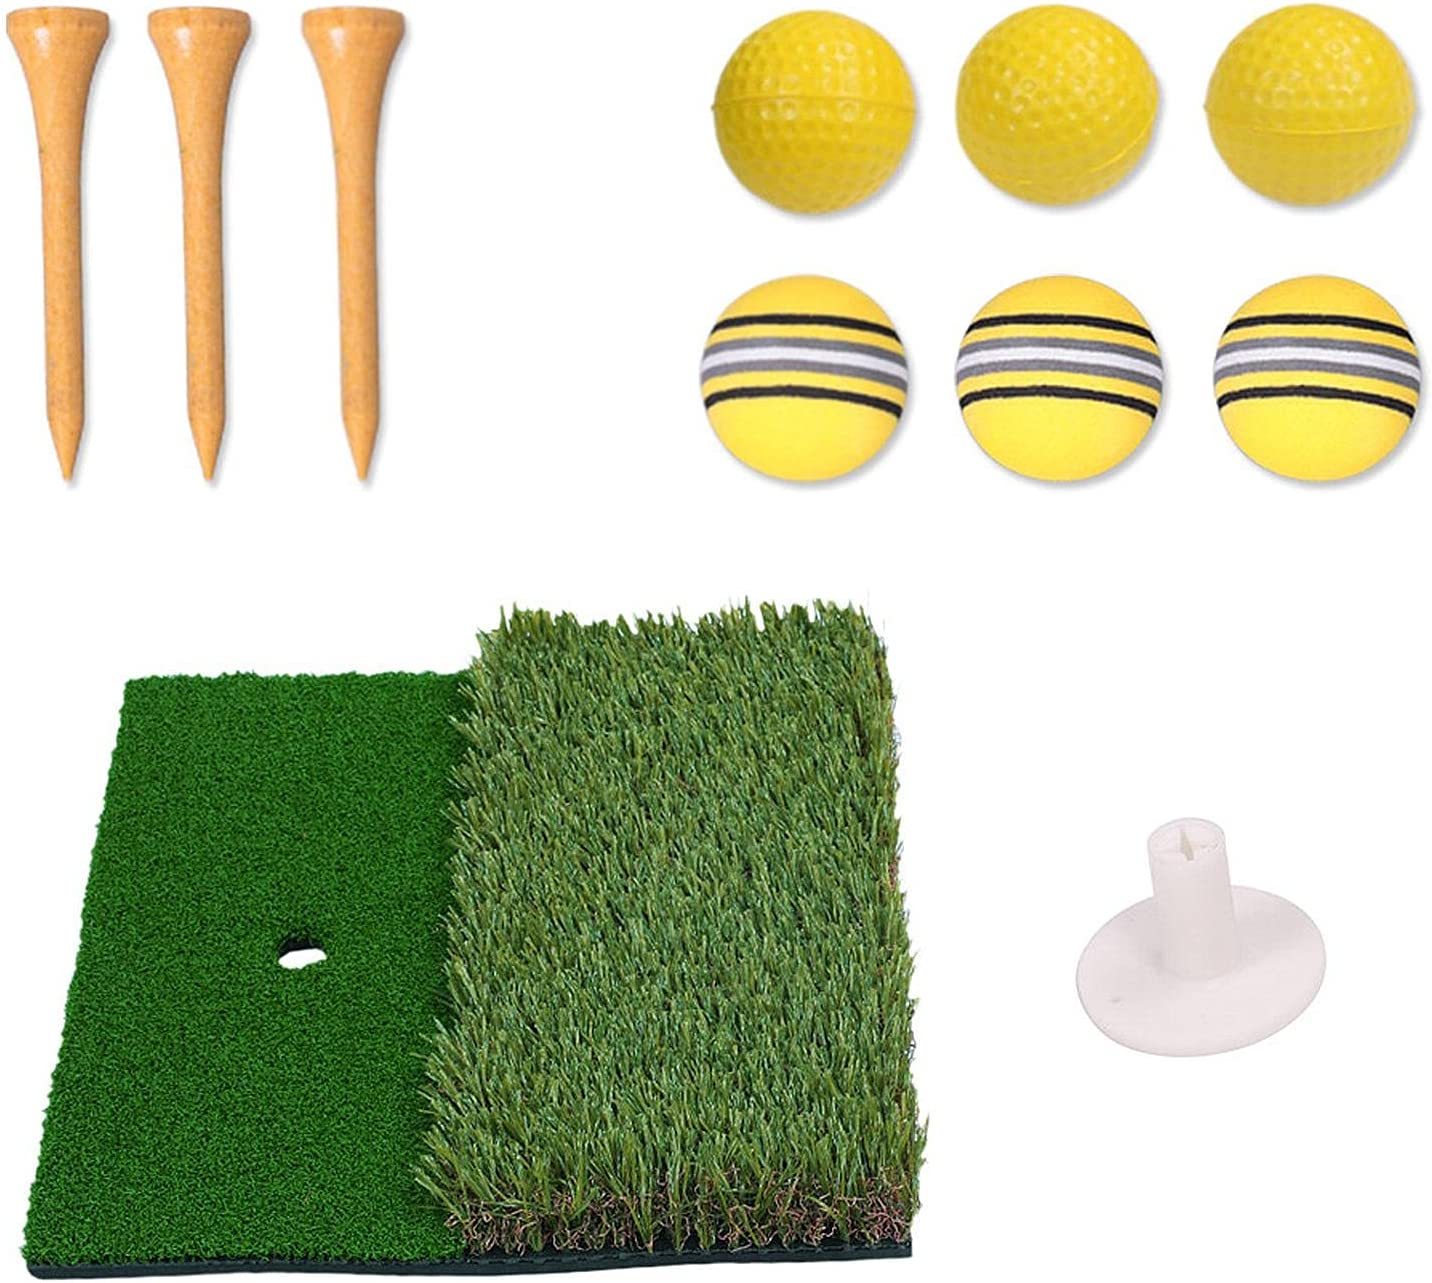 Latest item Brteyes Golf Hitting Mat Portable Practice Gra free shipping Training